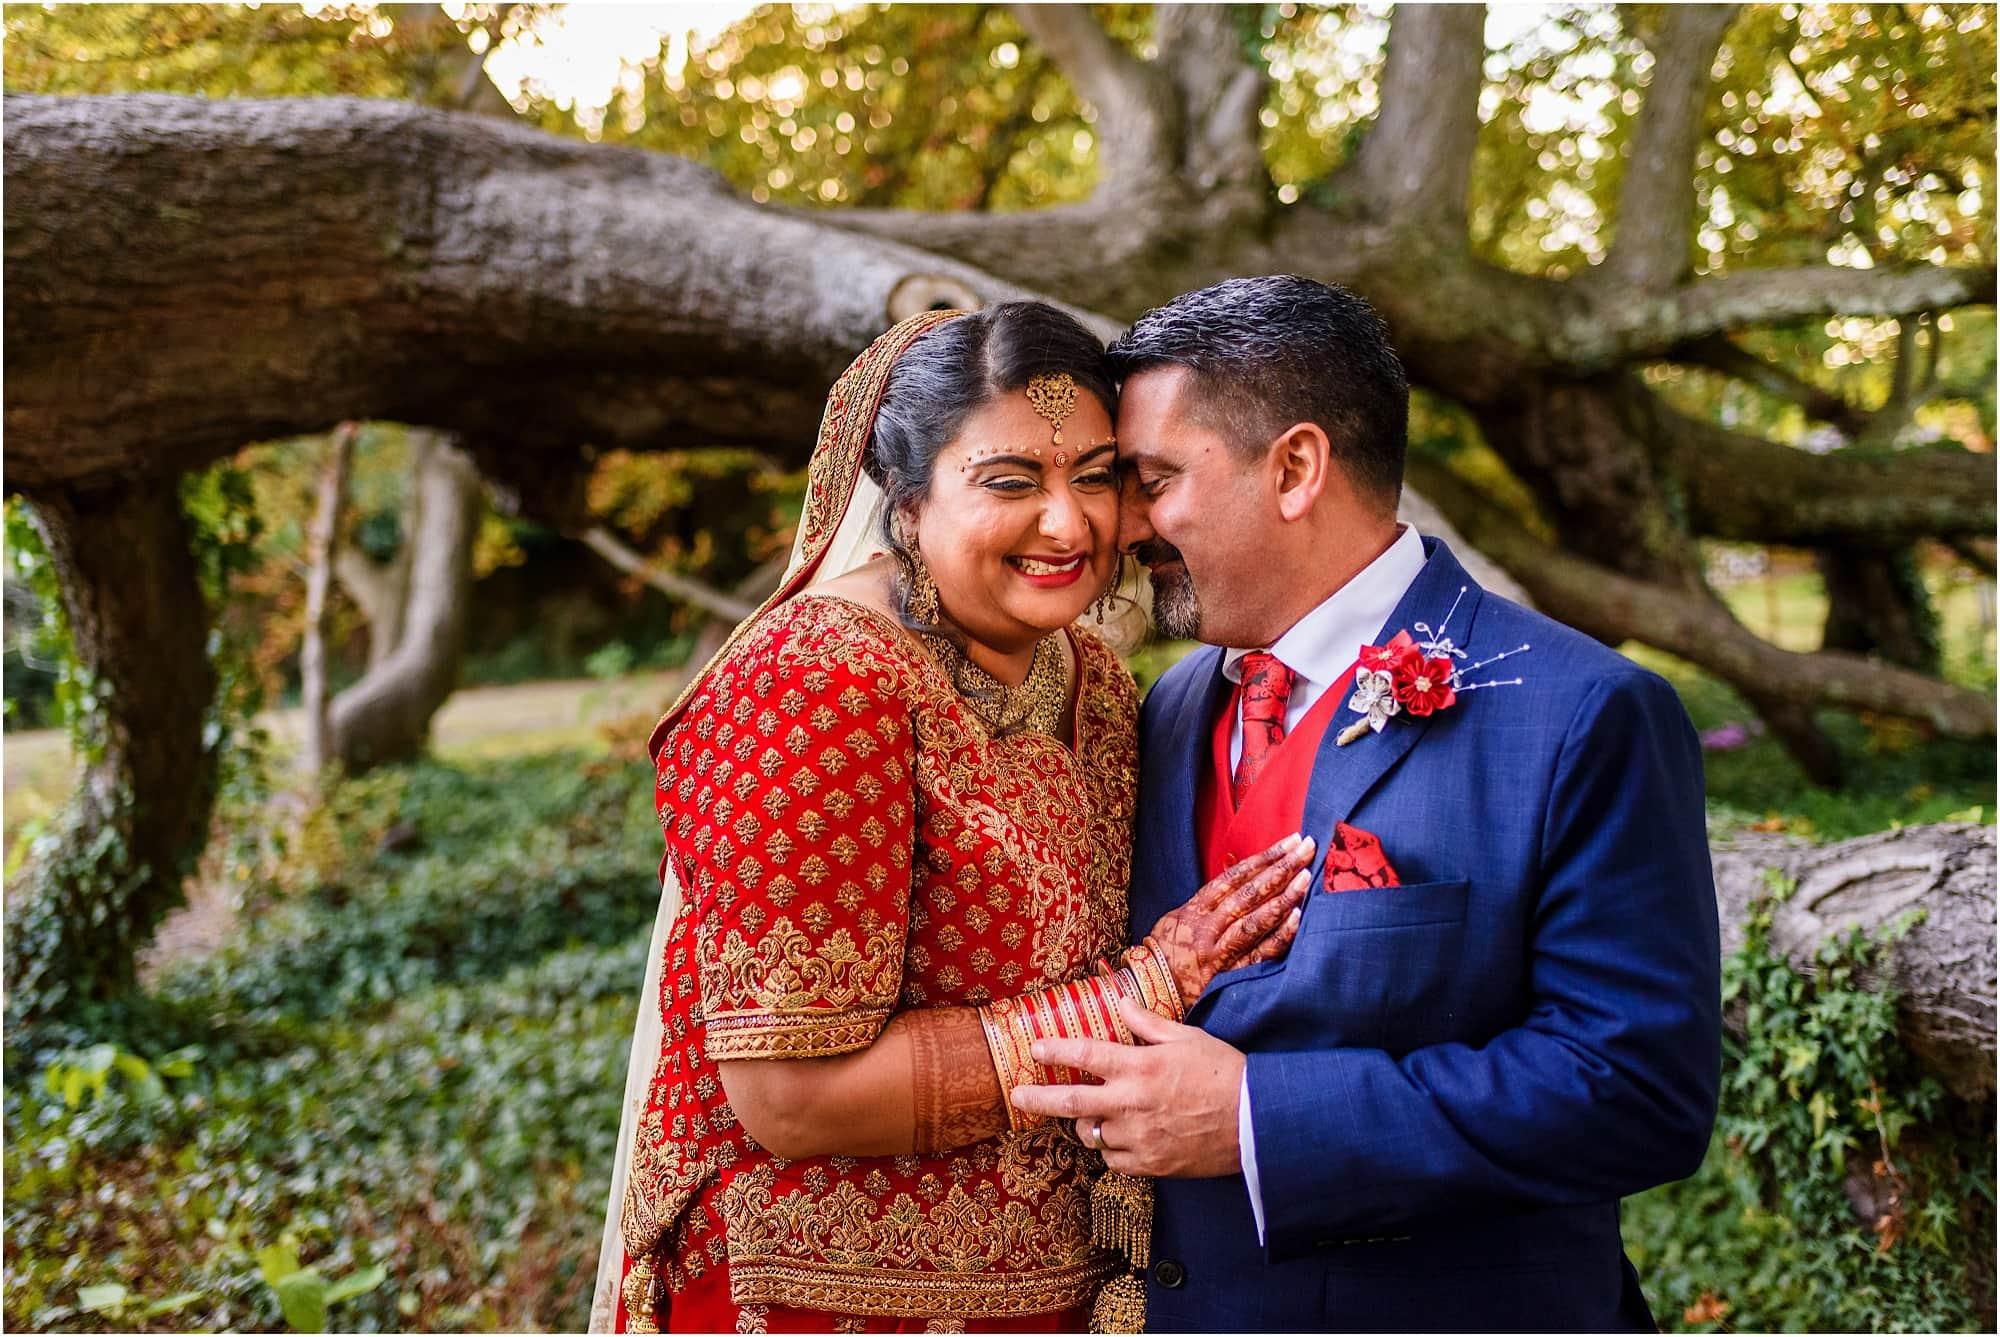 Childerley Hall Asian Wedding Photo